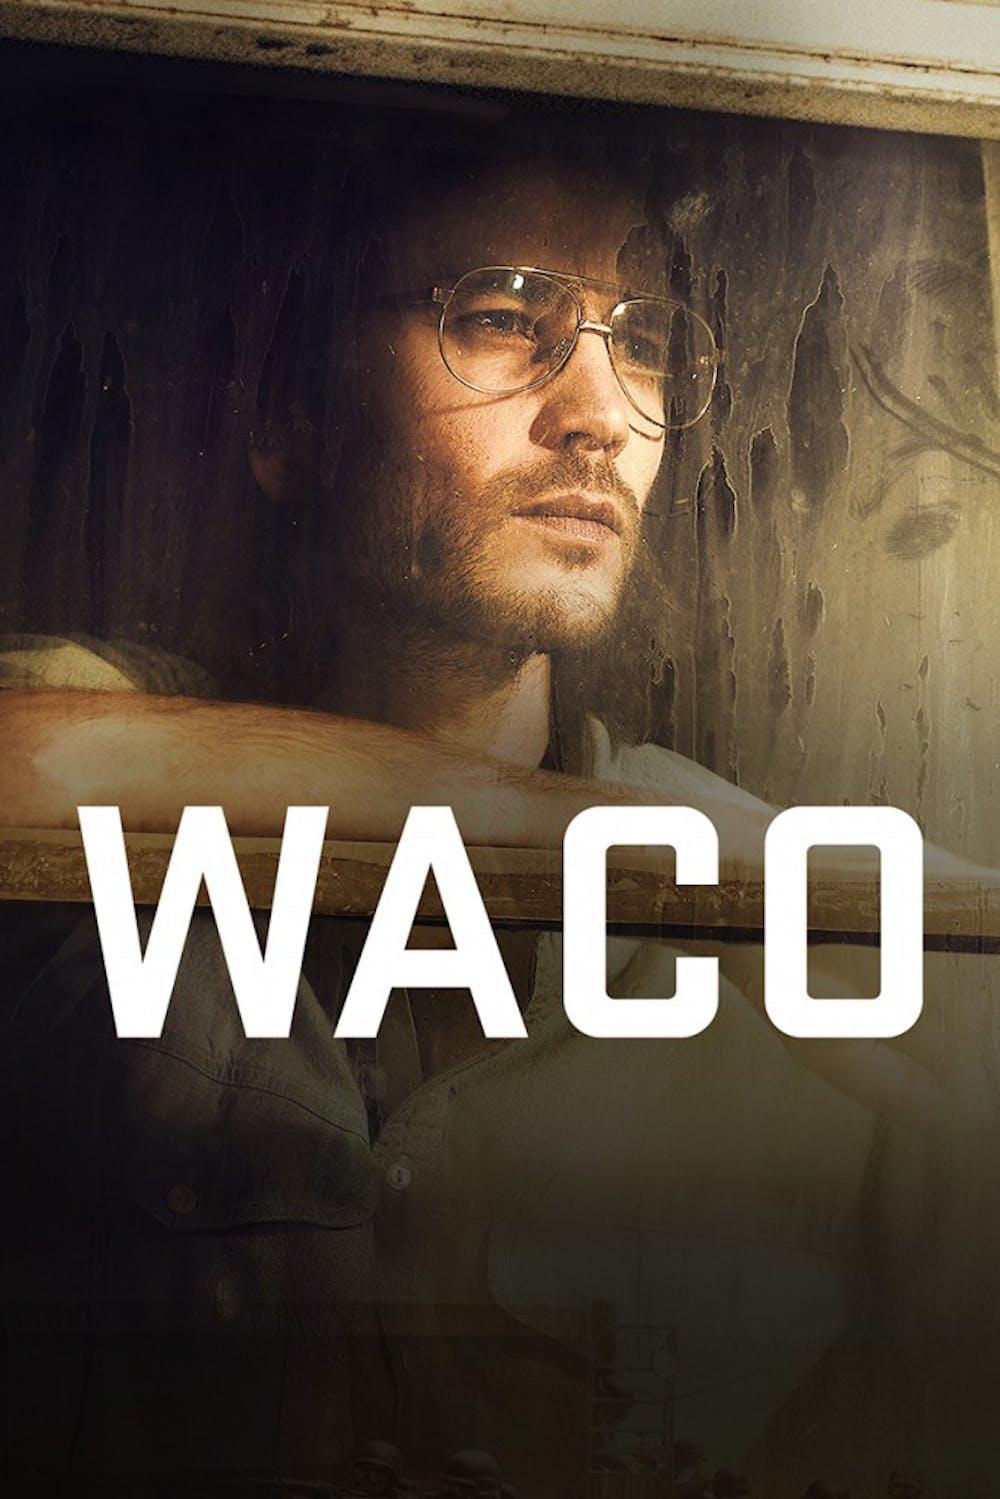 ae-wacoshowposter-courtesyparamountnetwork